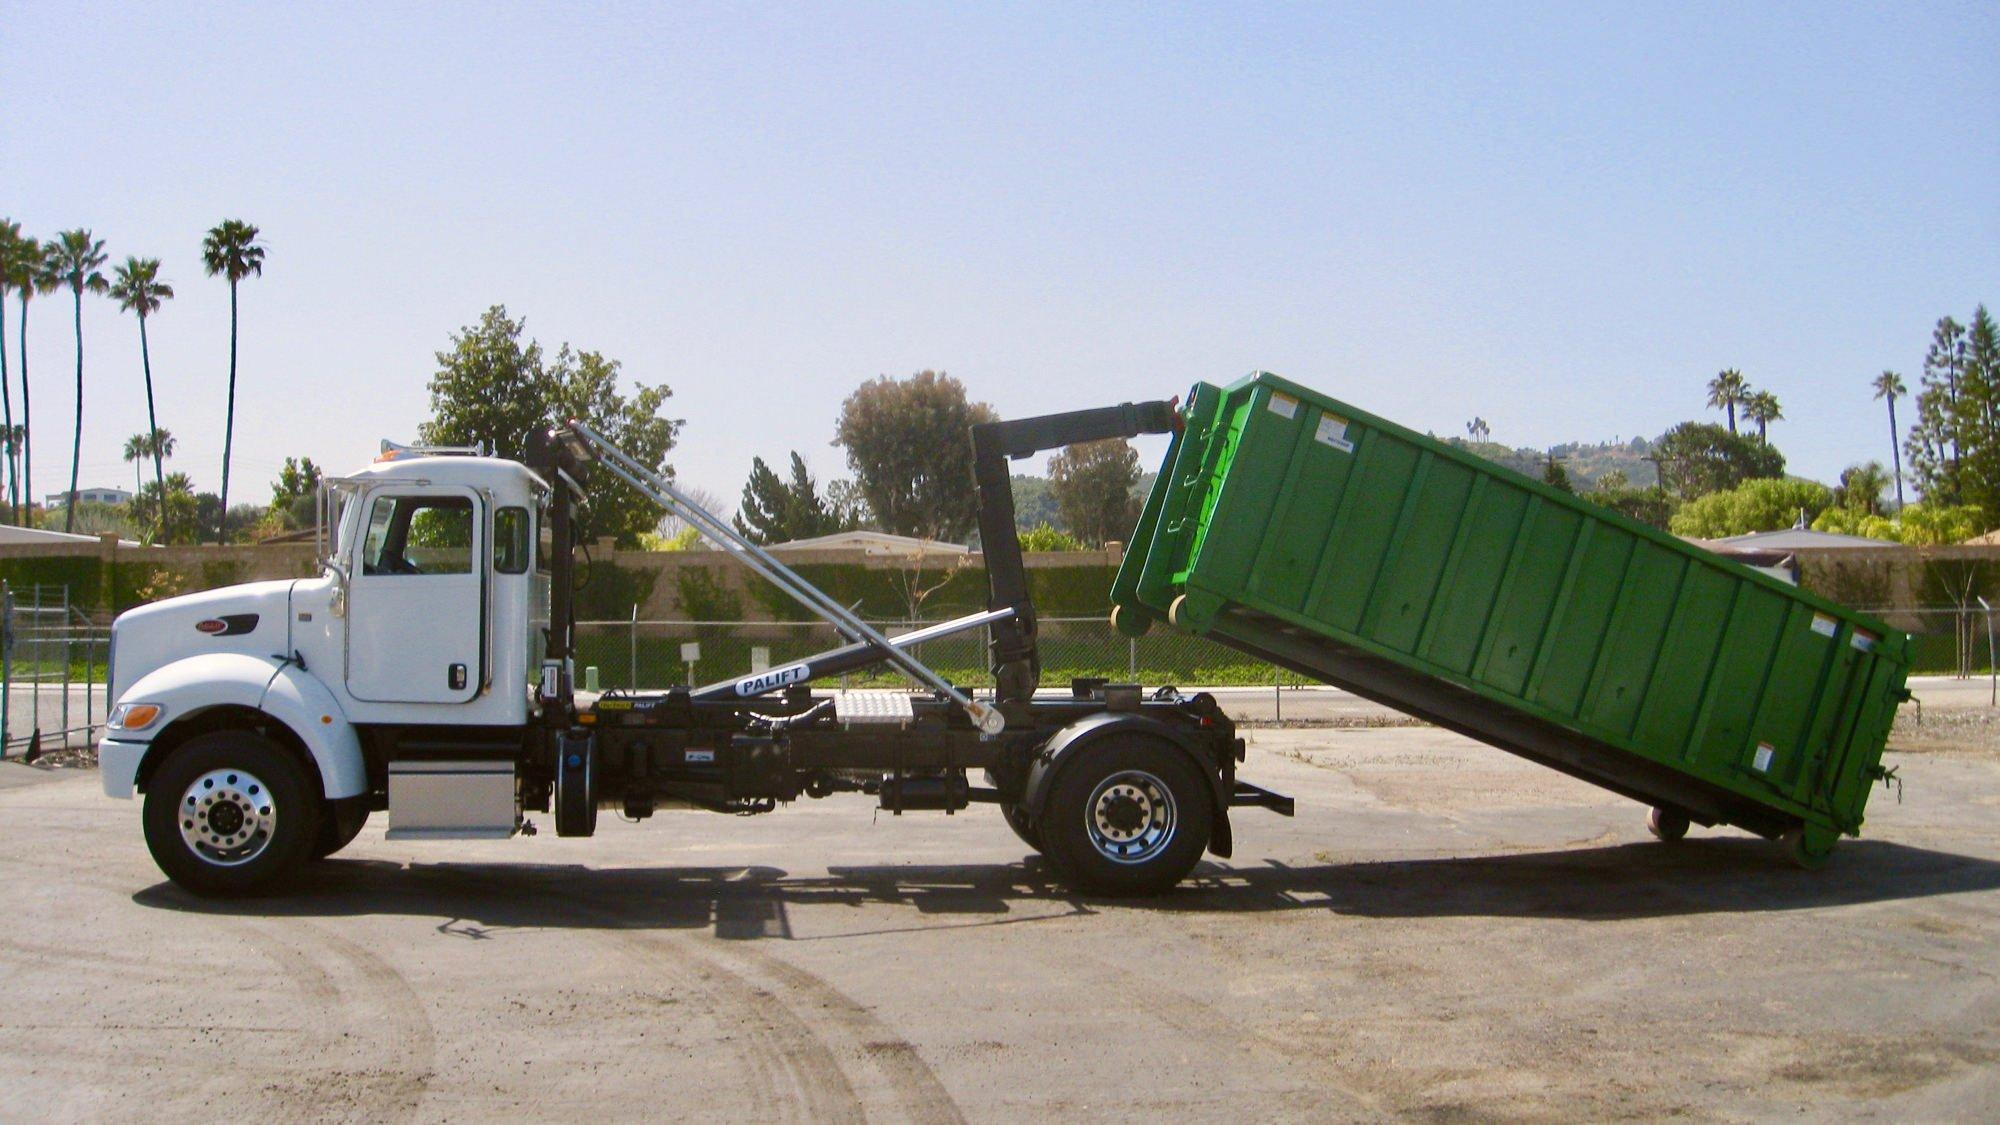 SwapLoader, Stellar, and Palfinger hooklift trucks